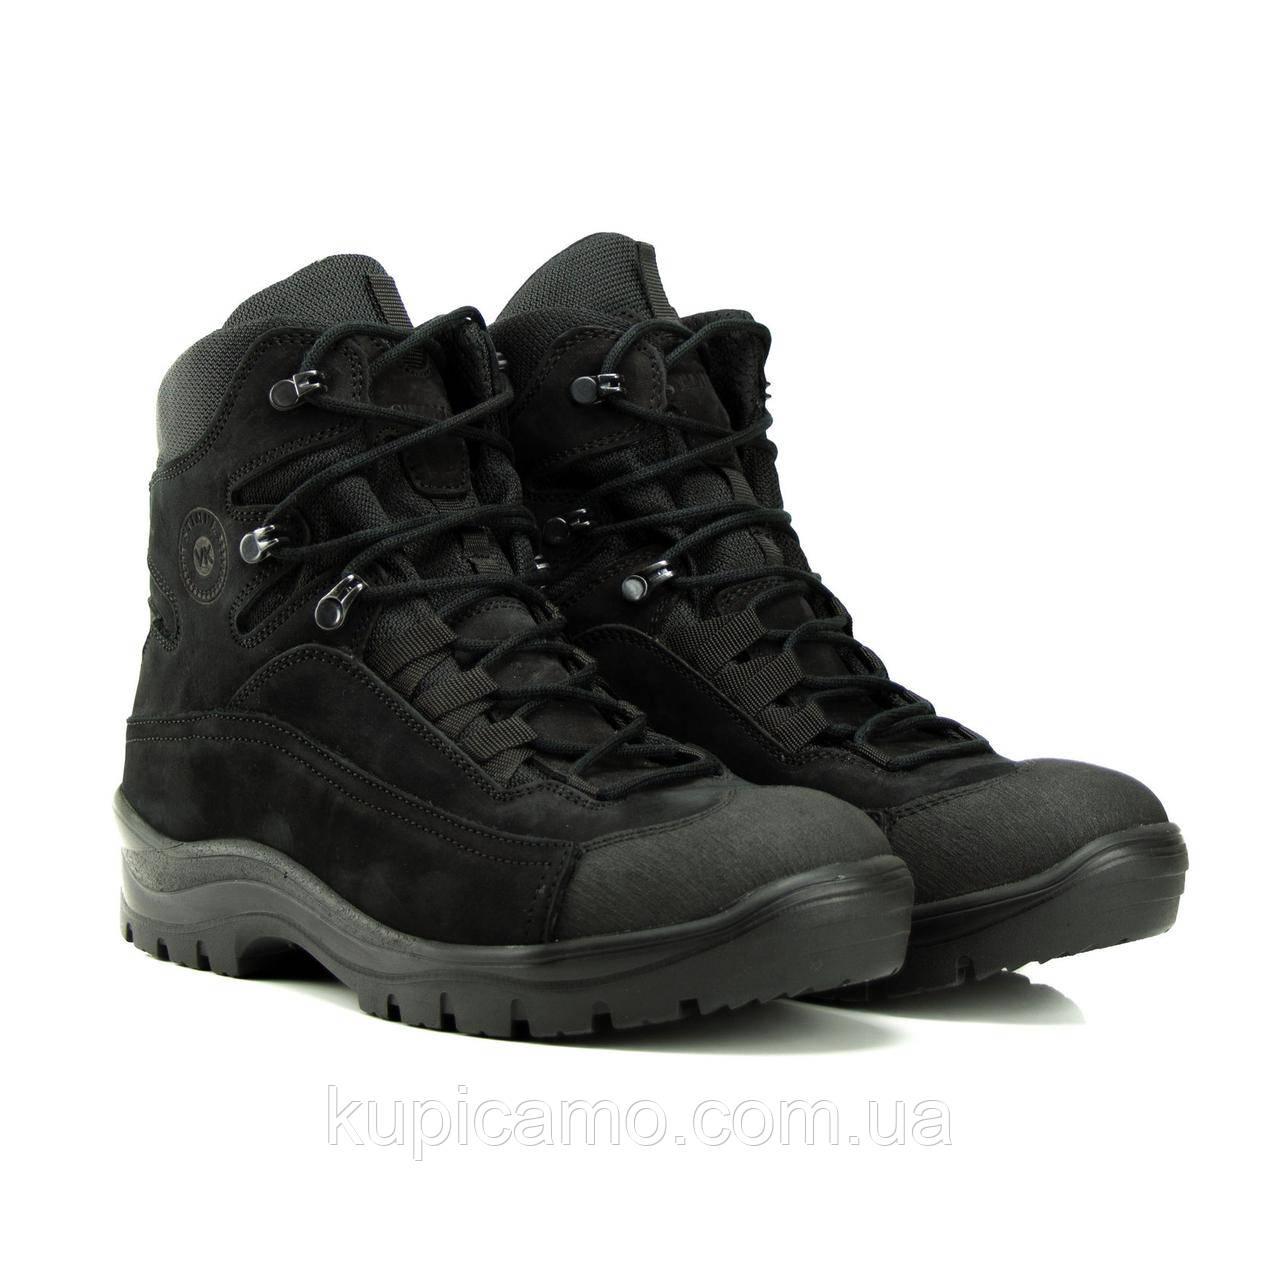 Ботинки Атаман зима (черный)